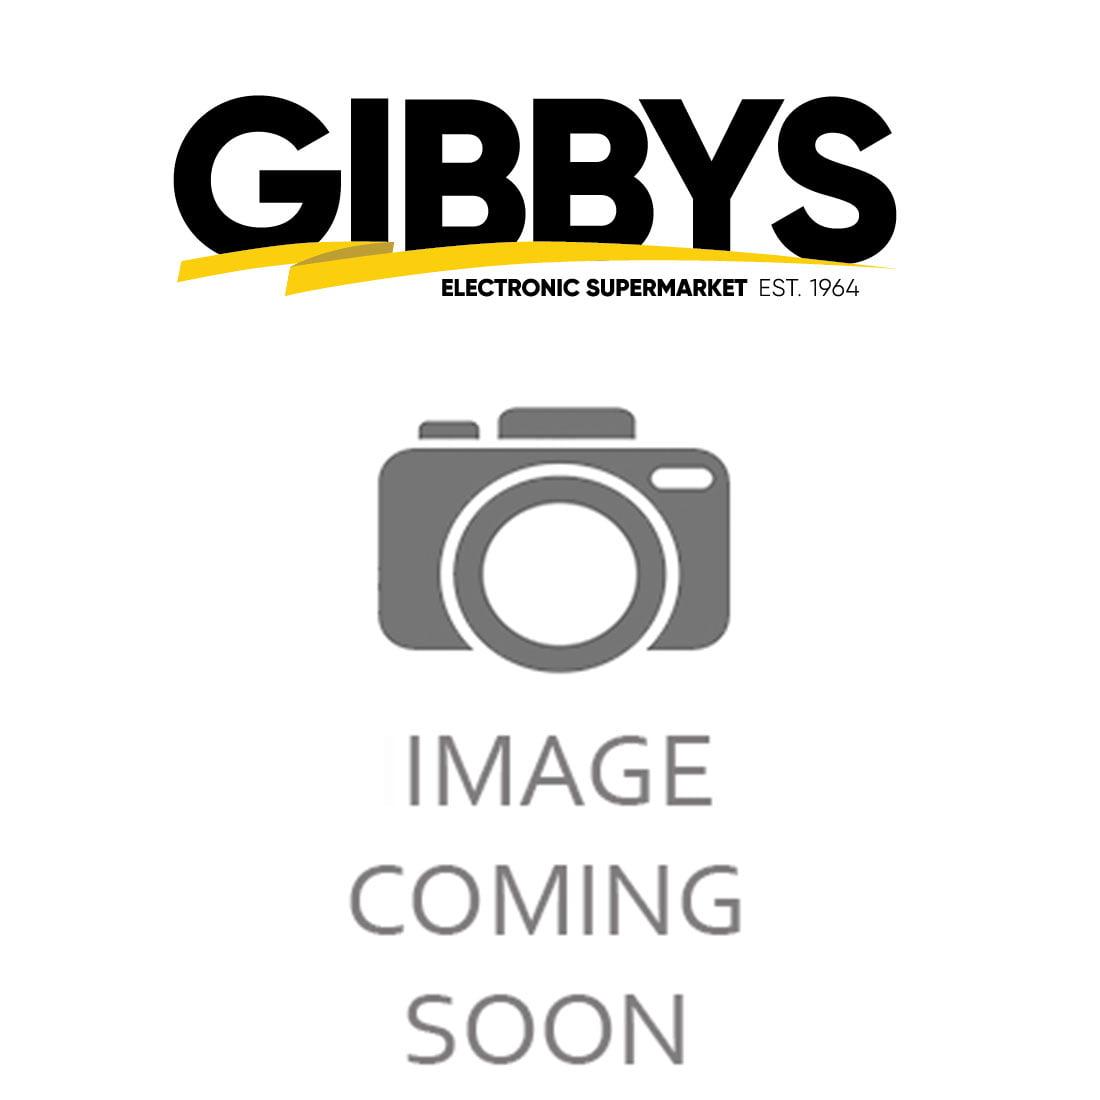 Samsung Qn75q90tafxzc 75 Qled 4k Smart Flat Screen Tv